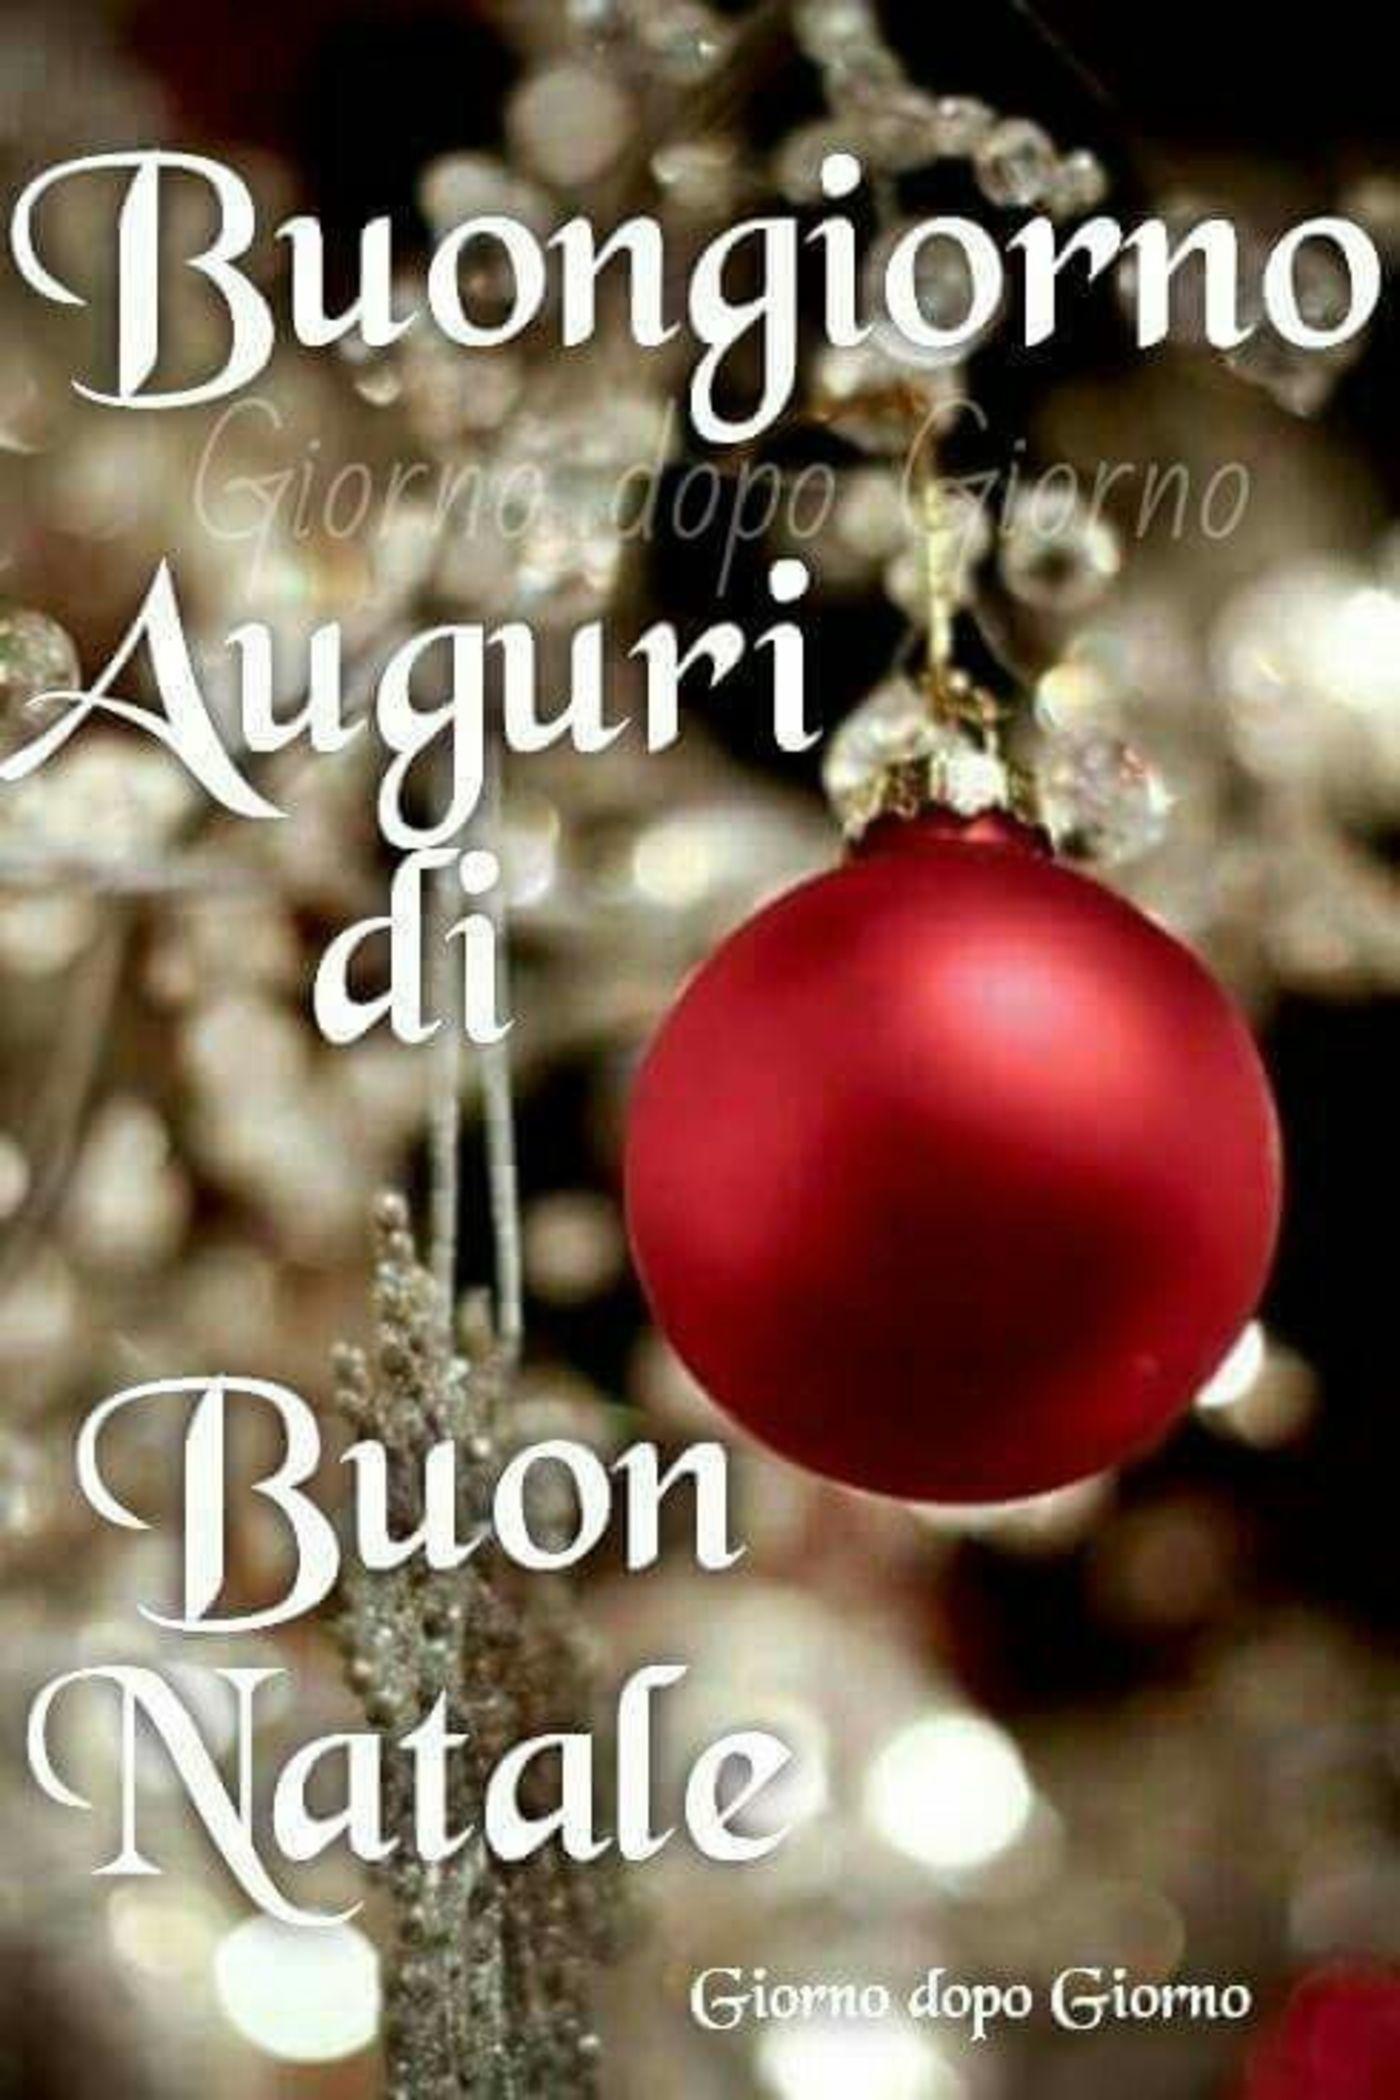 Tanti Auguri E Buon Natale.Buongiorno Auguri Di Buon Natale Christmas Images Christmas Bulbs Christmas Wishes